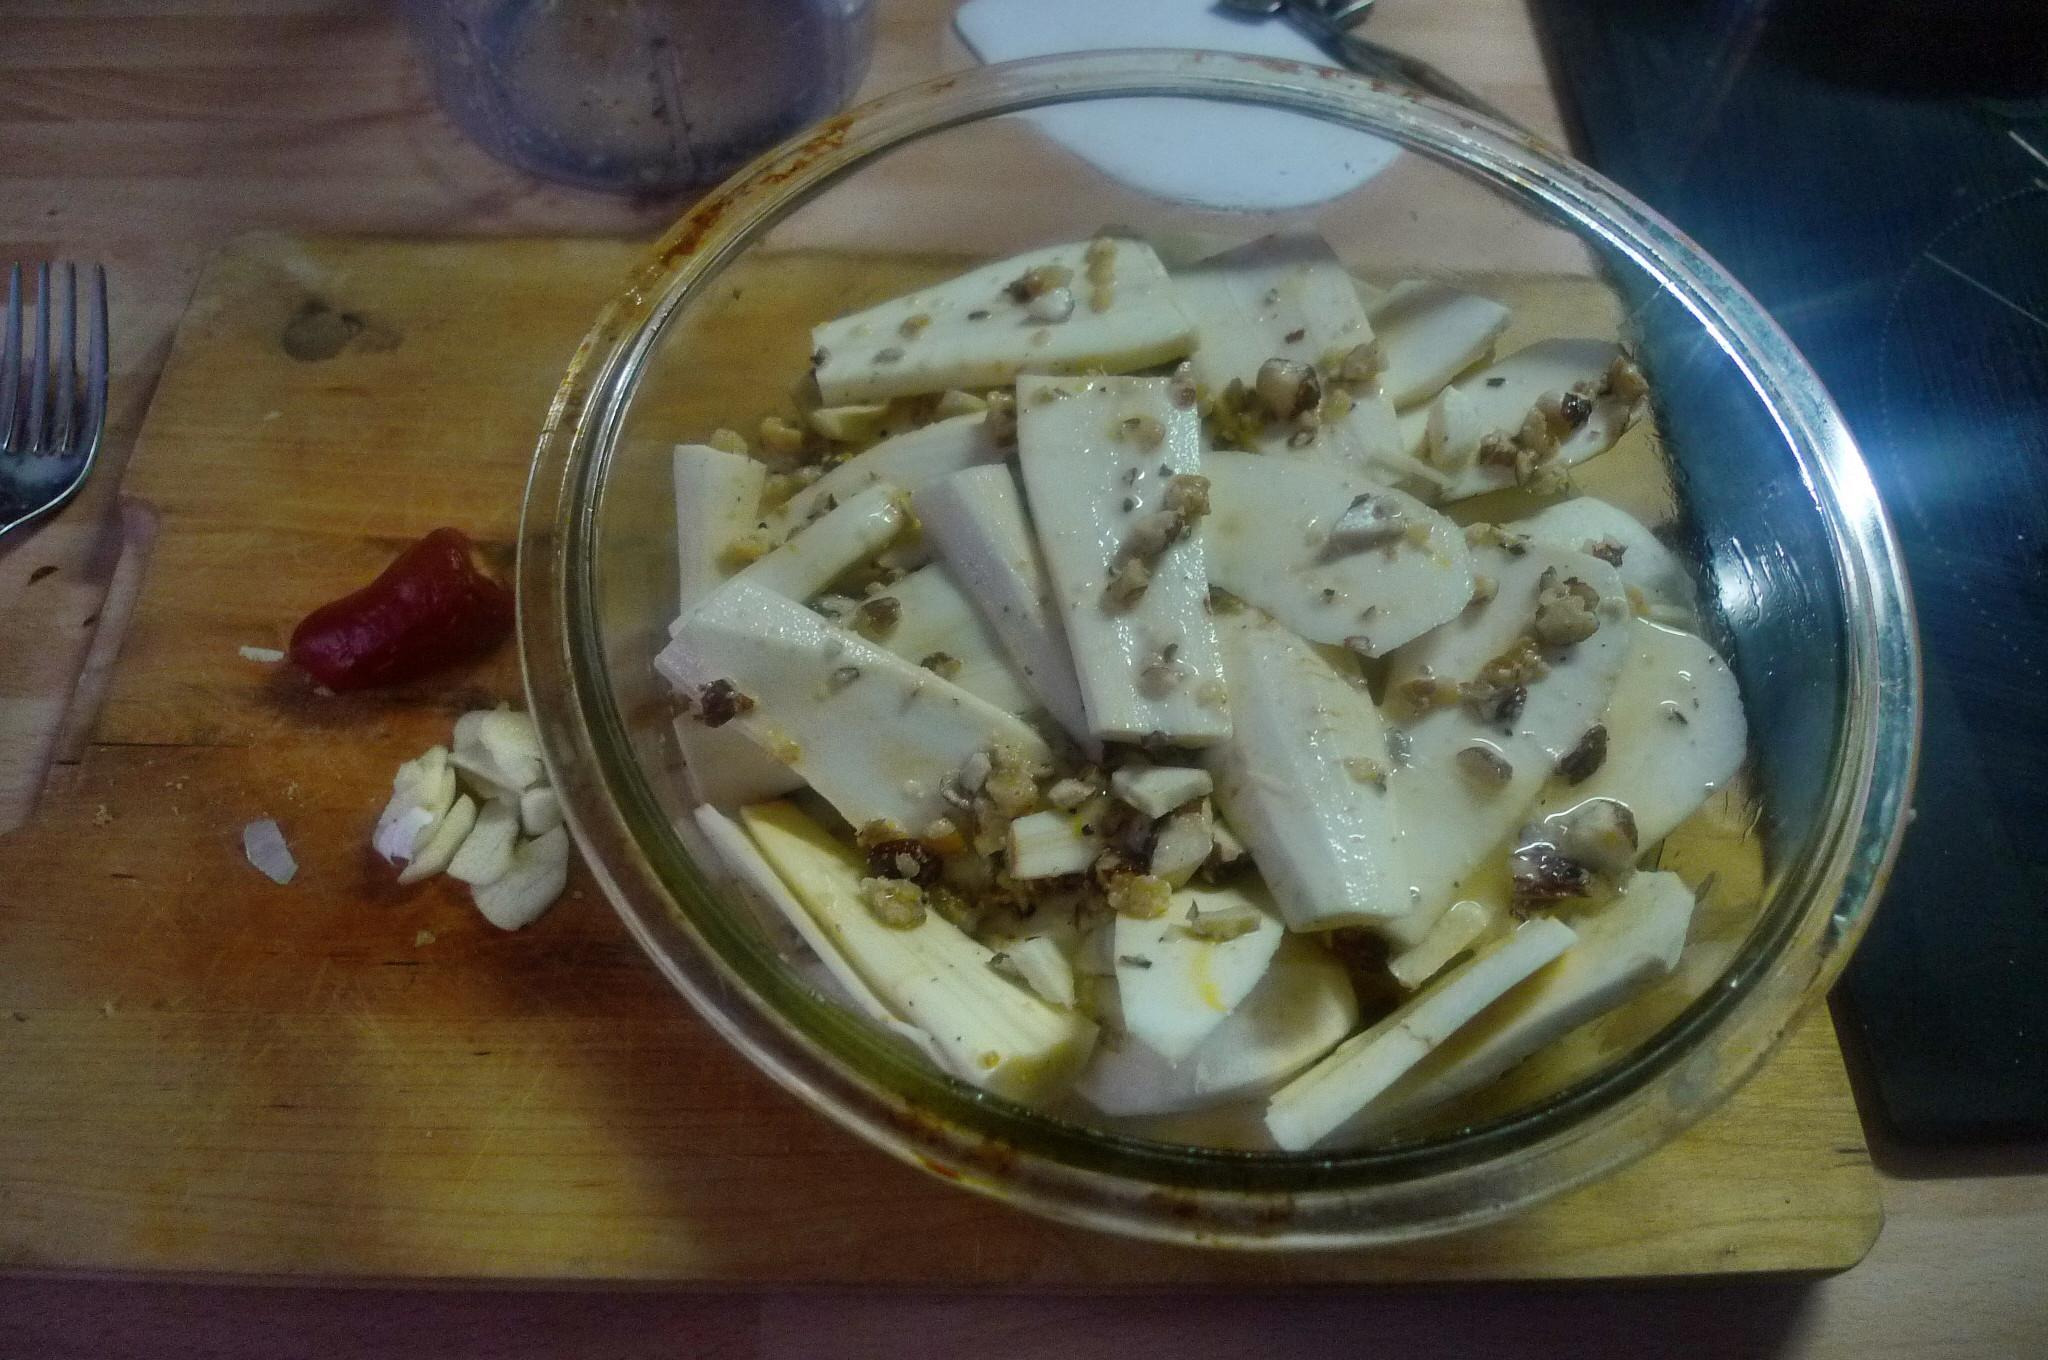 Pastinakengratin-Spinat-Salzkartoffeln -20.1.15   (2) - Kopie